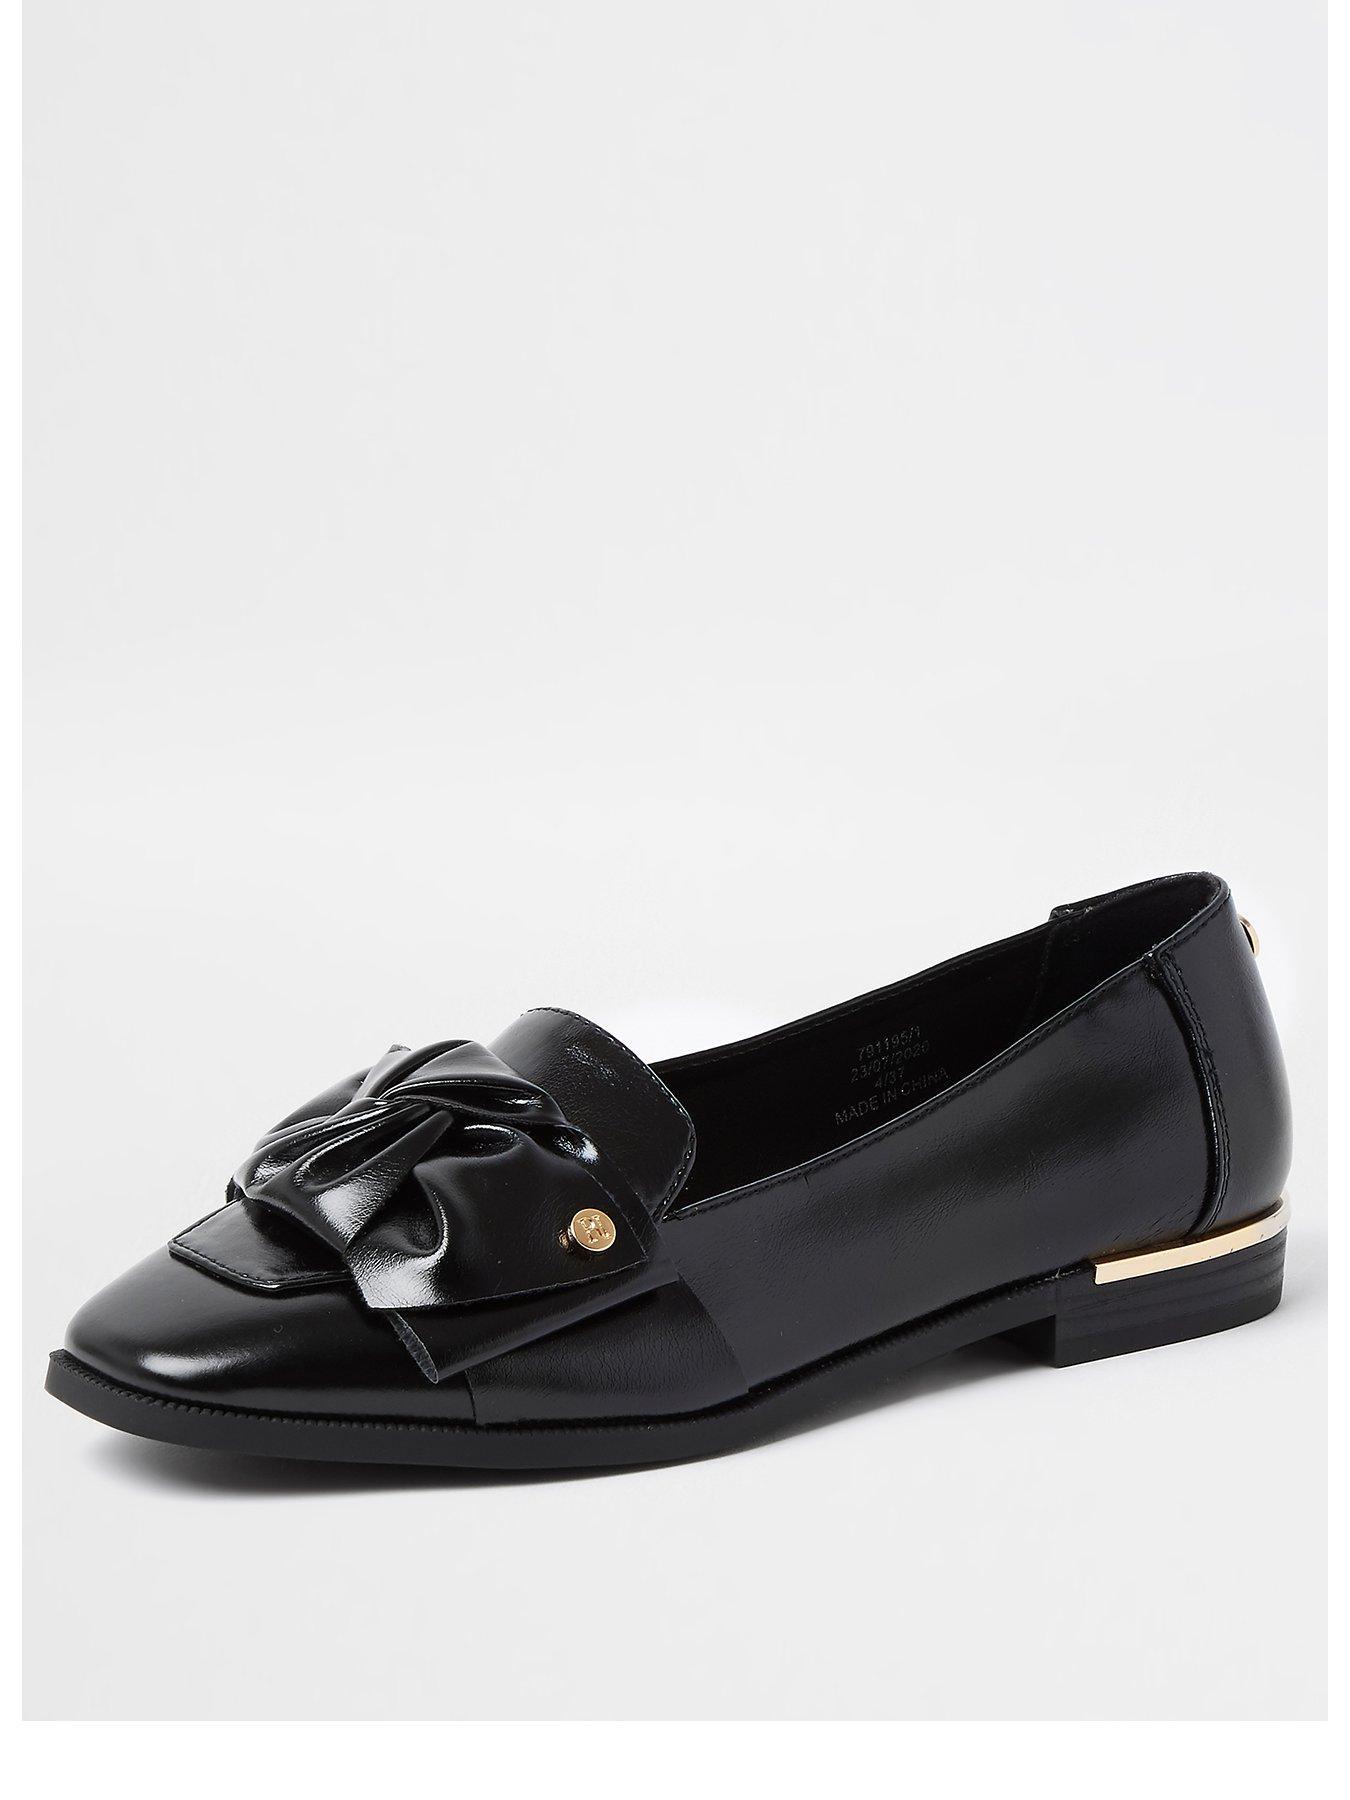 River island | Flats | Shoes \u0026 boots